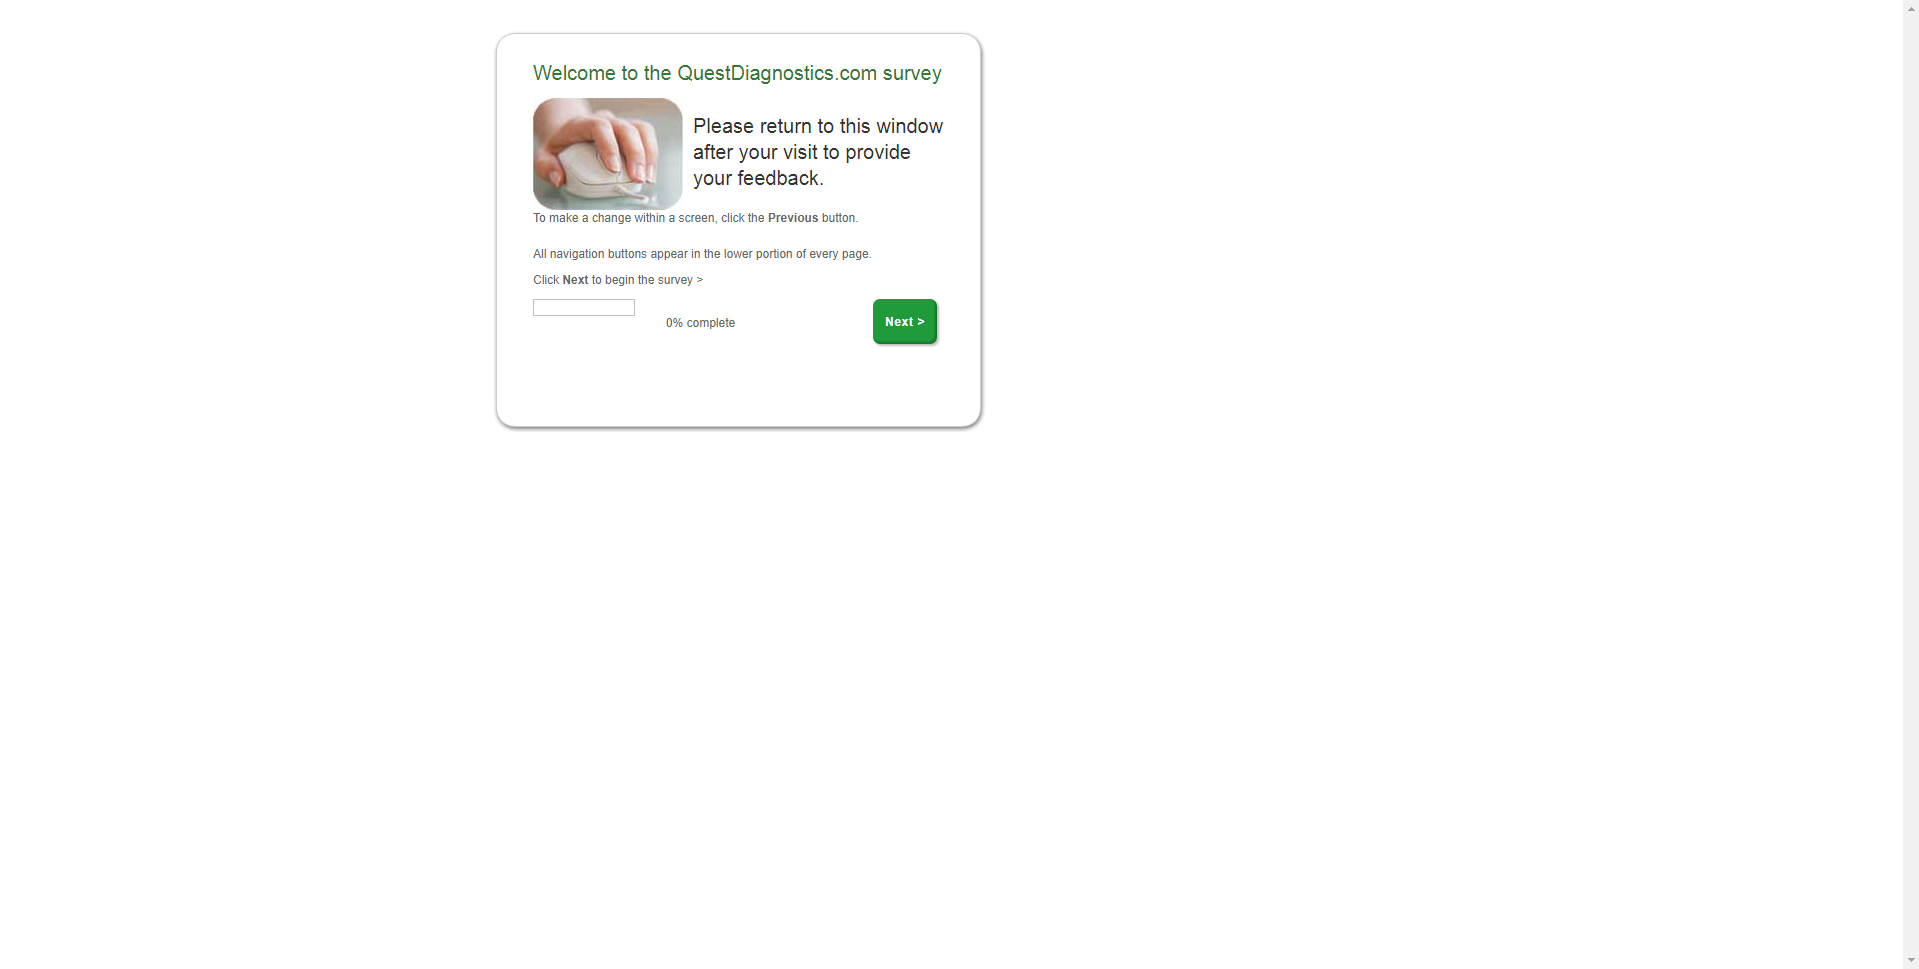 secure.questdiagnostics.com/ViewsFlash/servlet/viewsflash?cmd=page&pollid=popup!user_satisfaction